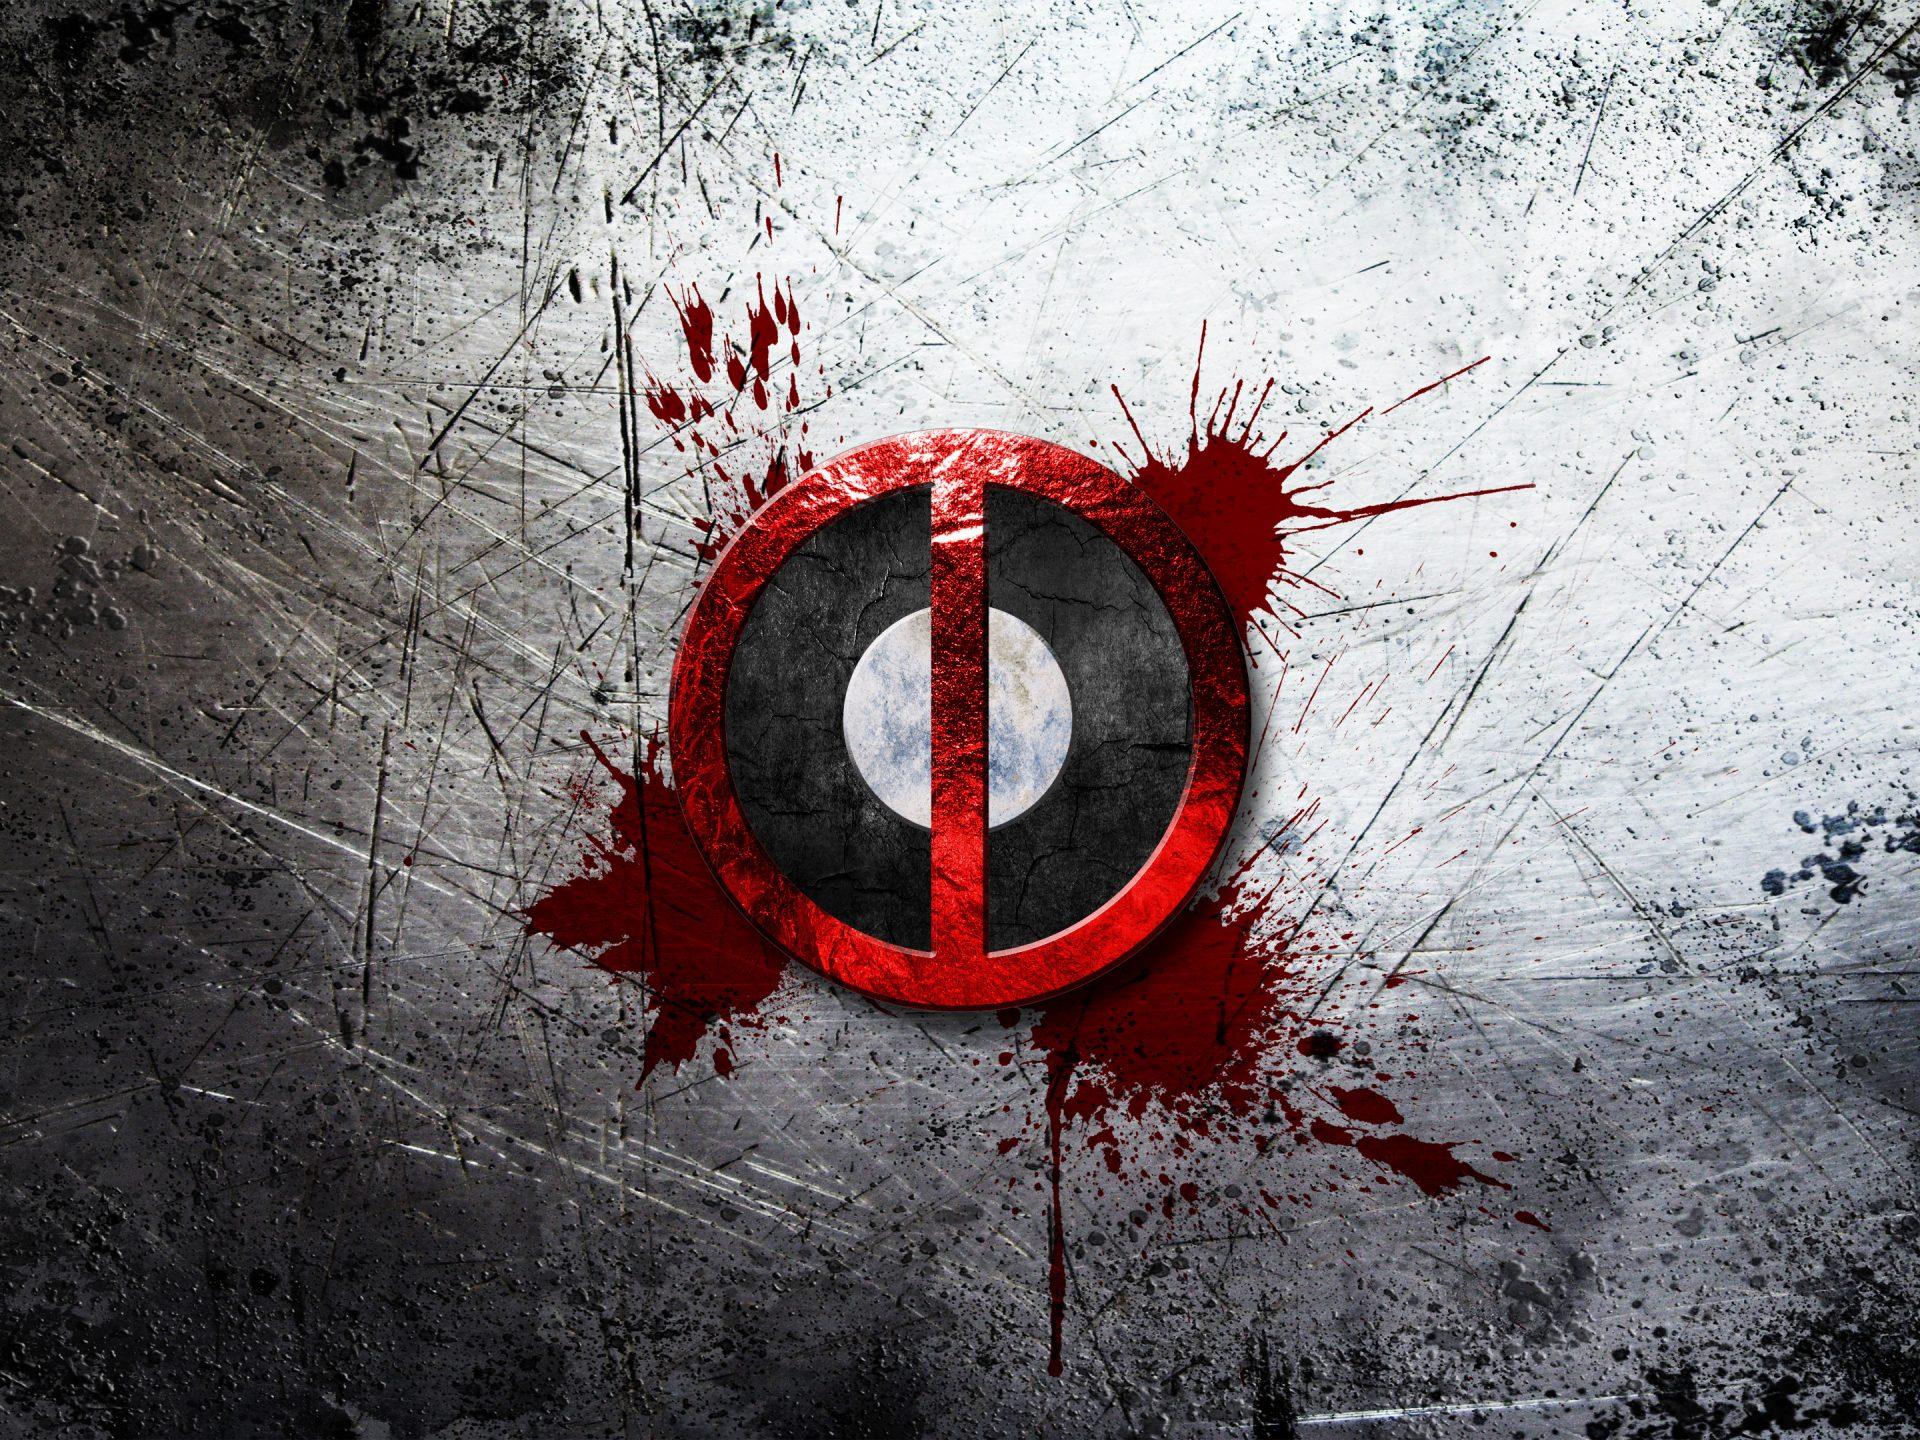 Deadpool Hd Wallpaper Iphone Deadpool Logo 4k Uhd Wallpaper